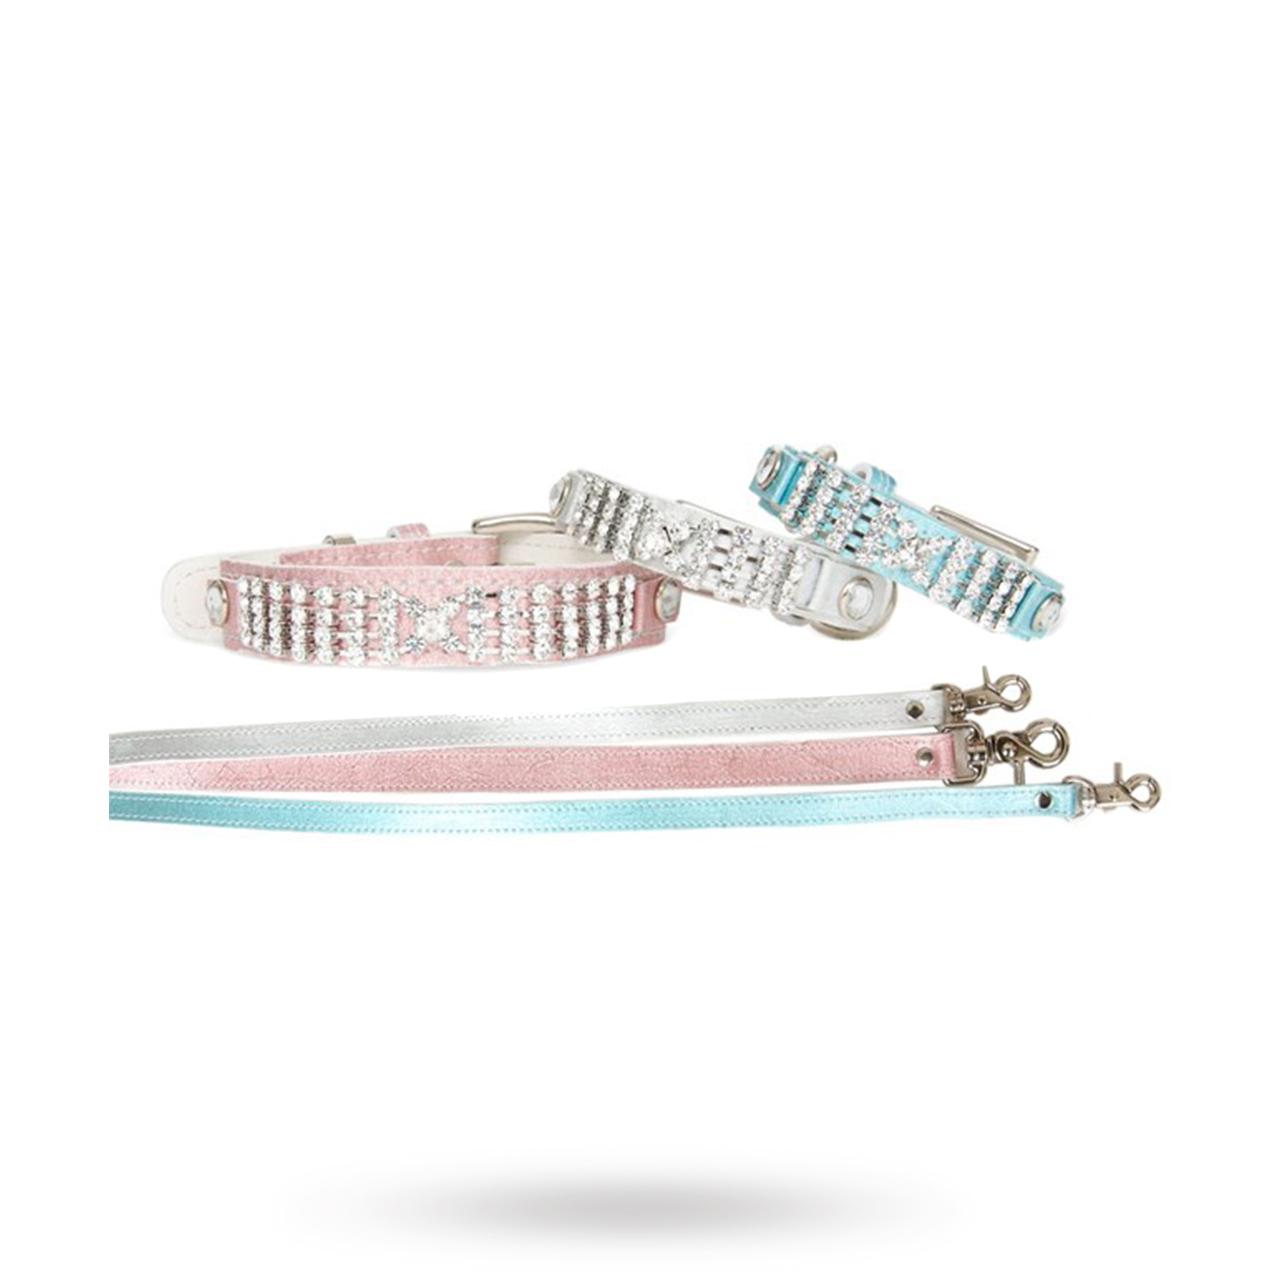 PA Shiny Luxury Collar Silver - XL